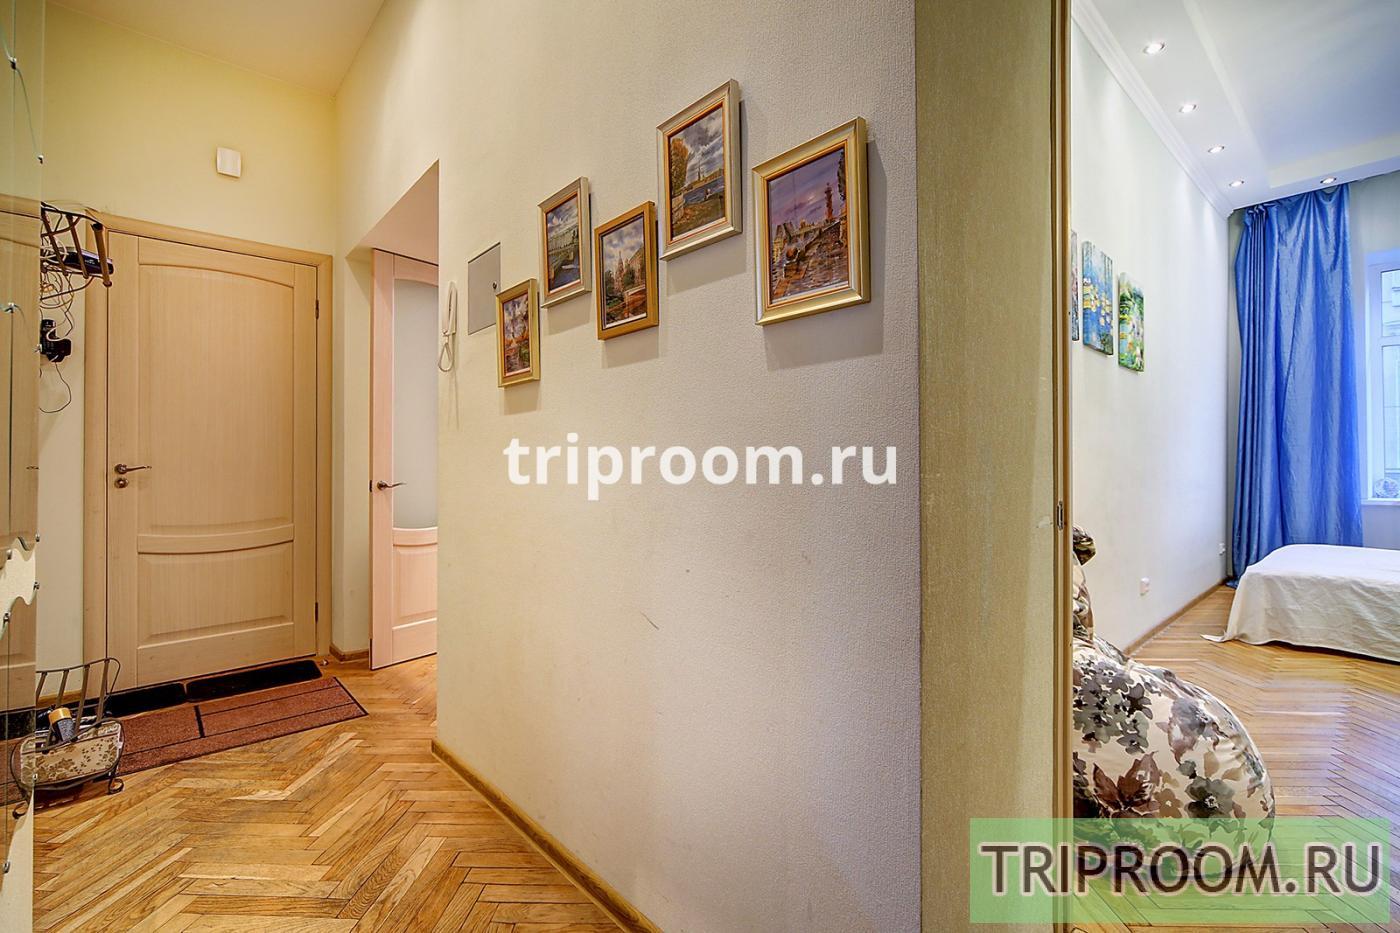 2-комнатная квартира посуточно (вариант № 15426), ул. Лиговский проспект, фото № 18